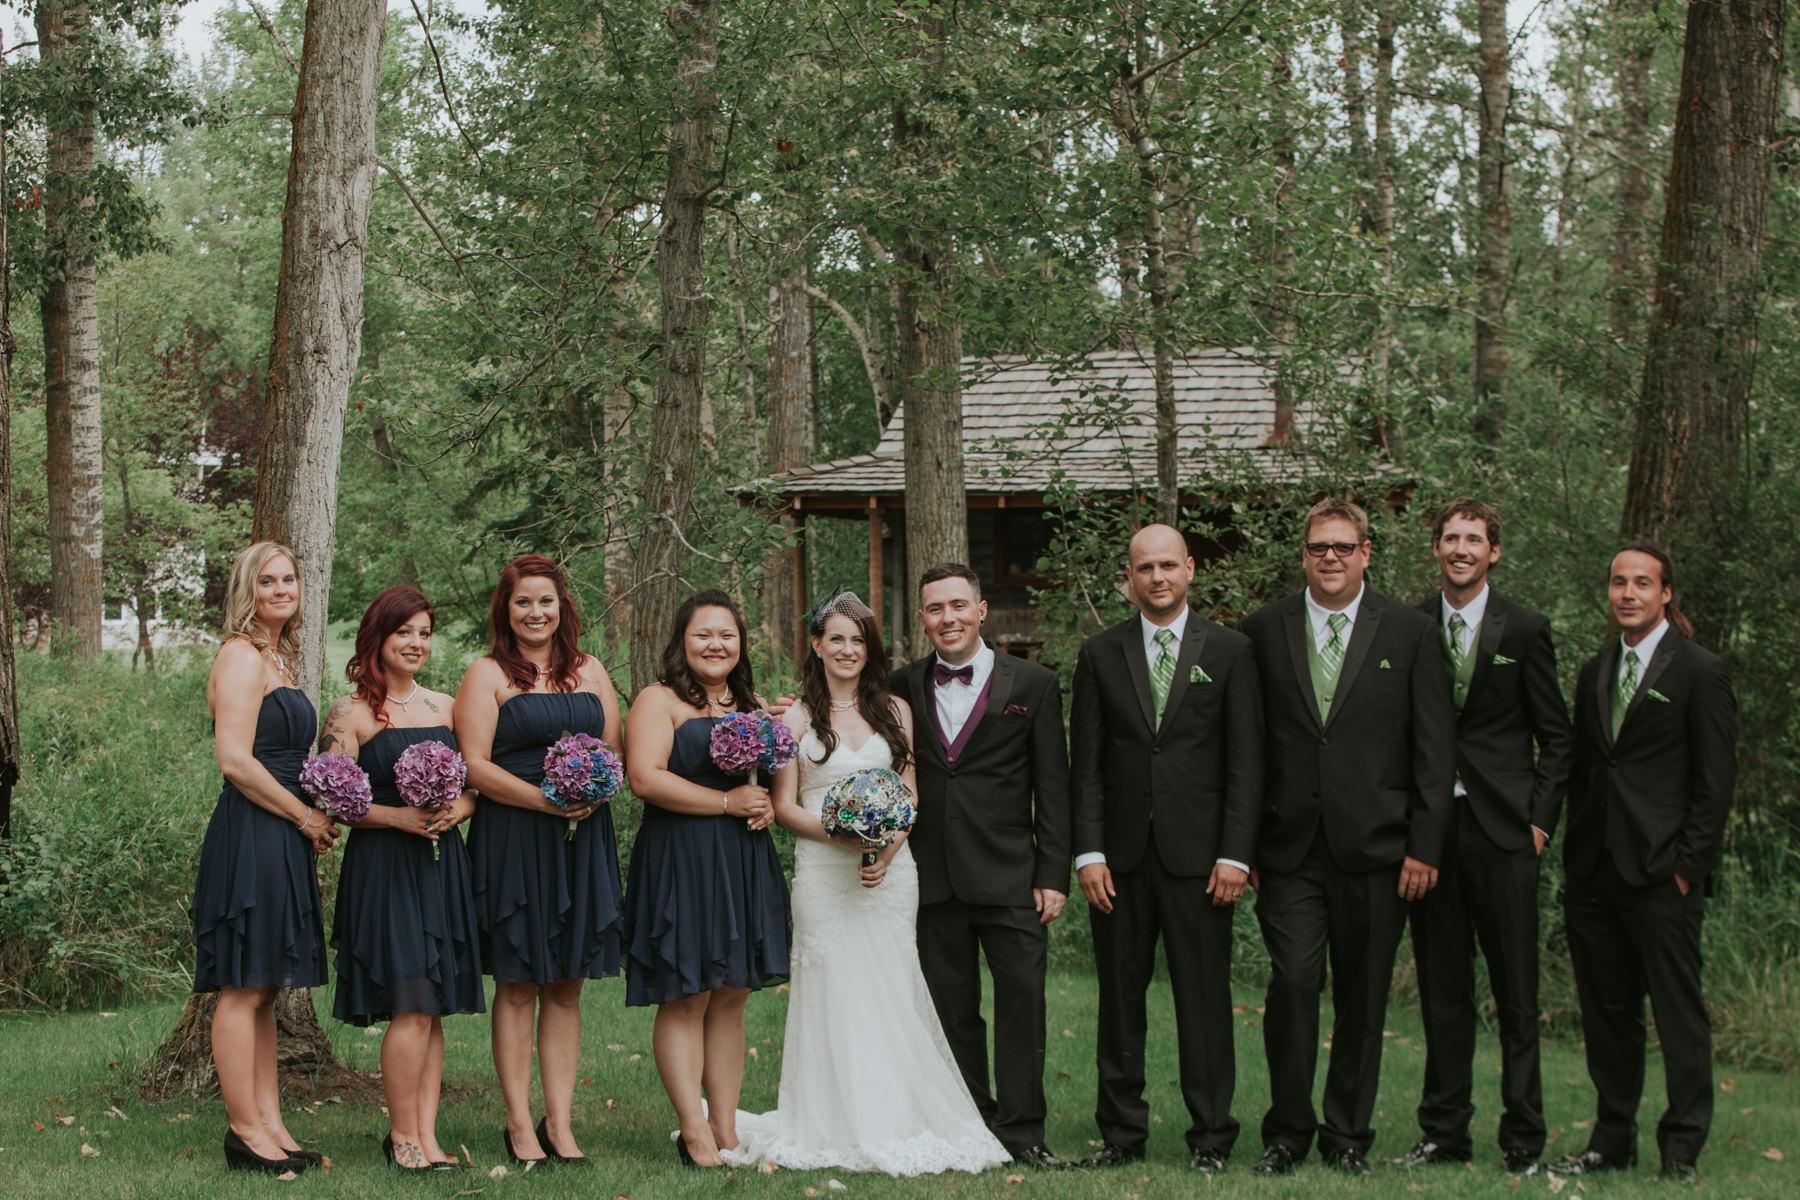 Vancouver Wedding Photographer Pam (50).jpg